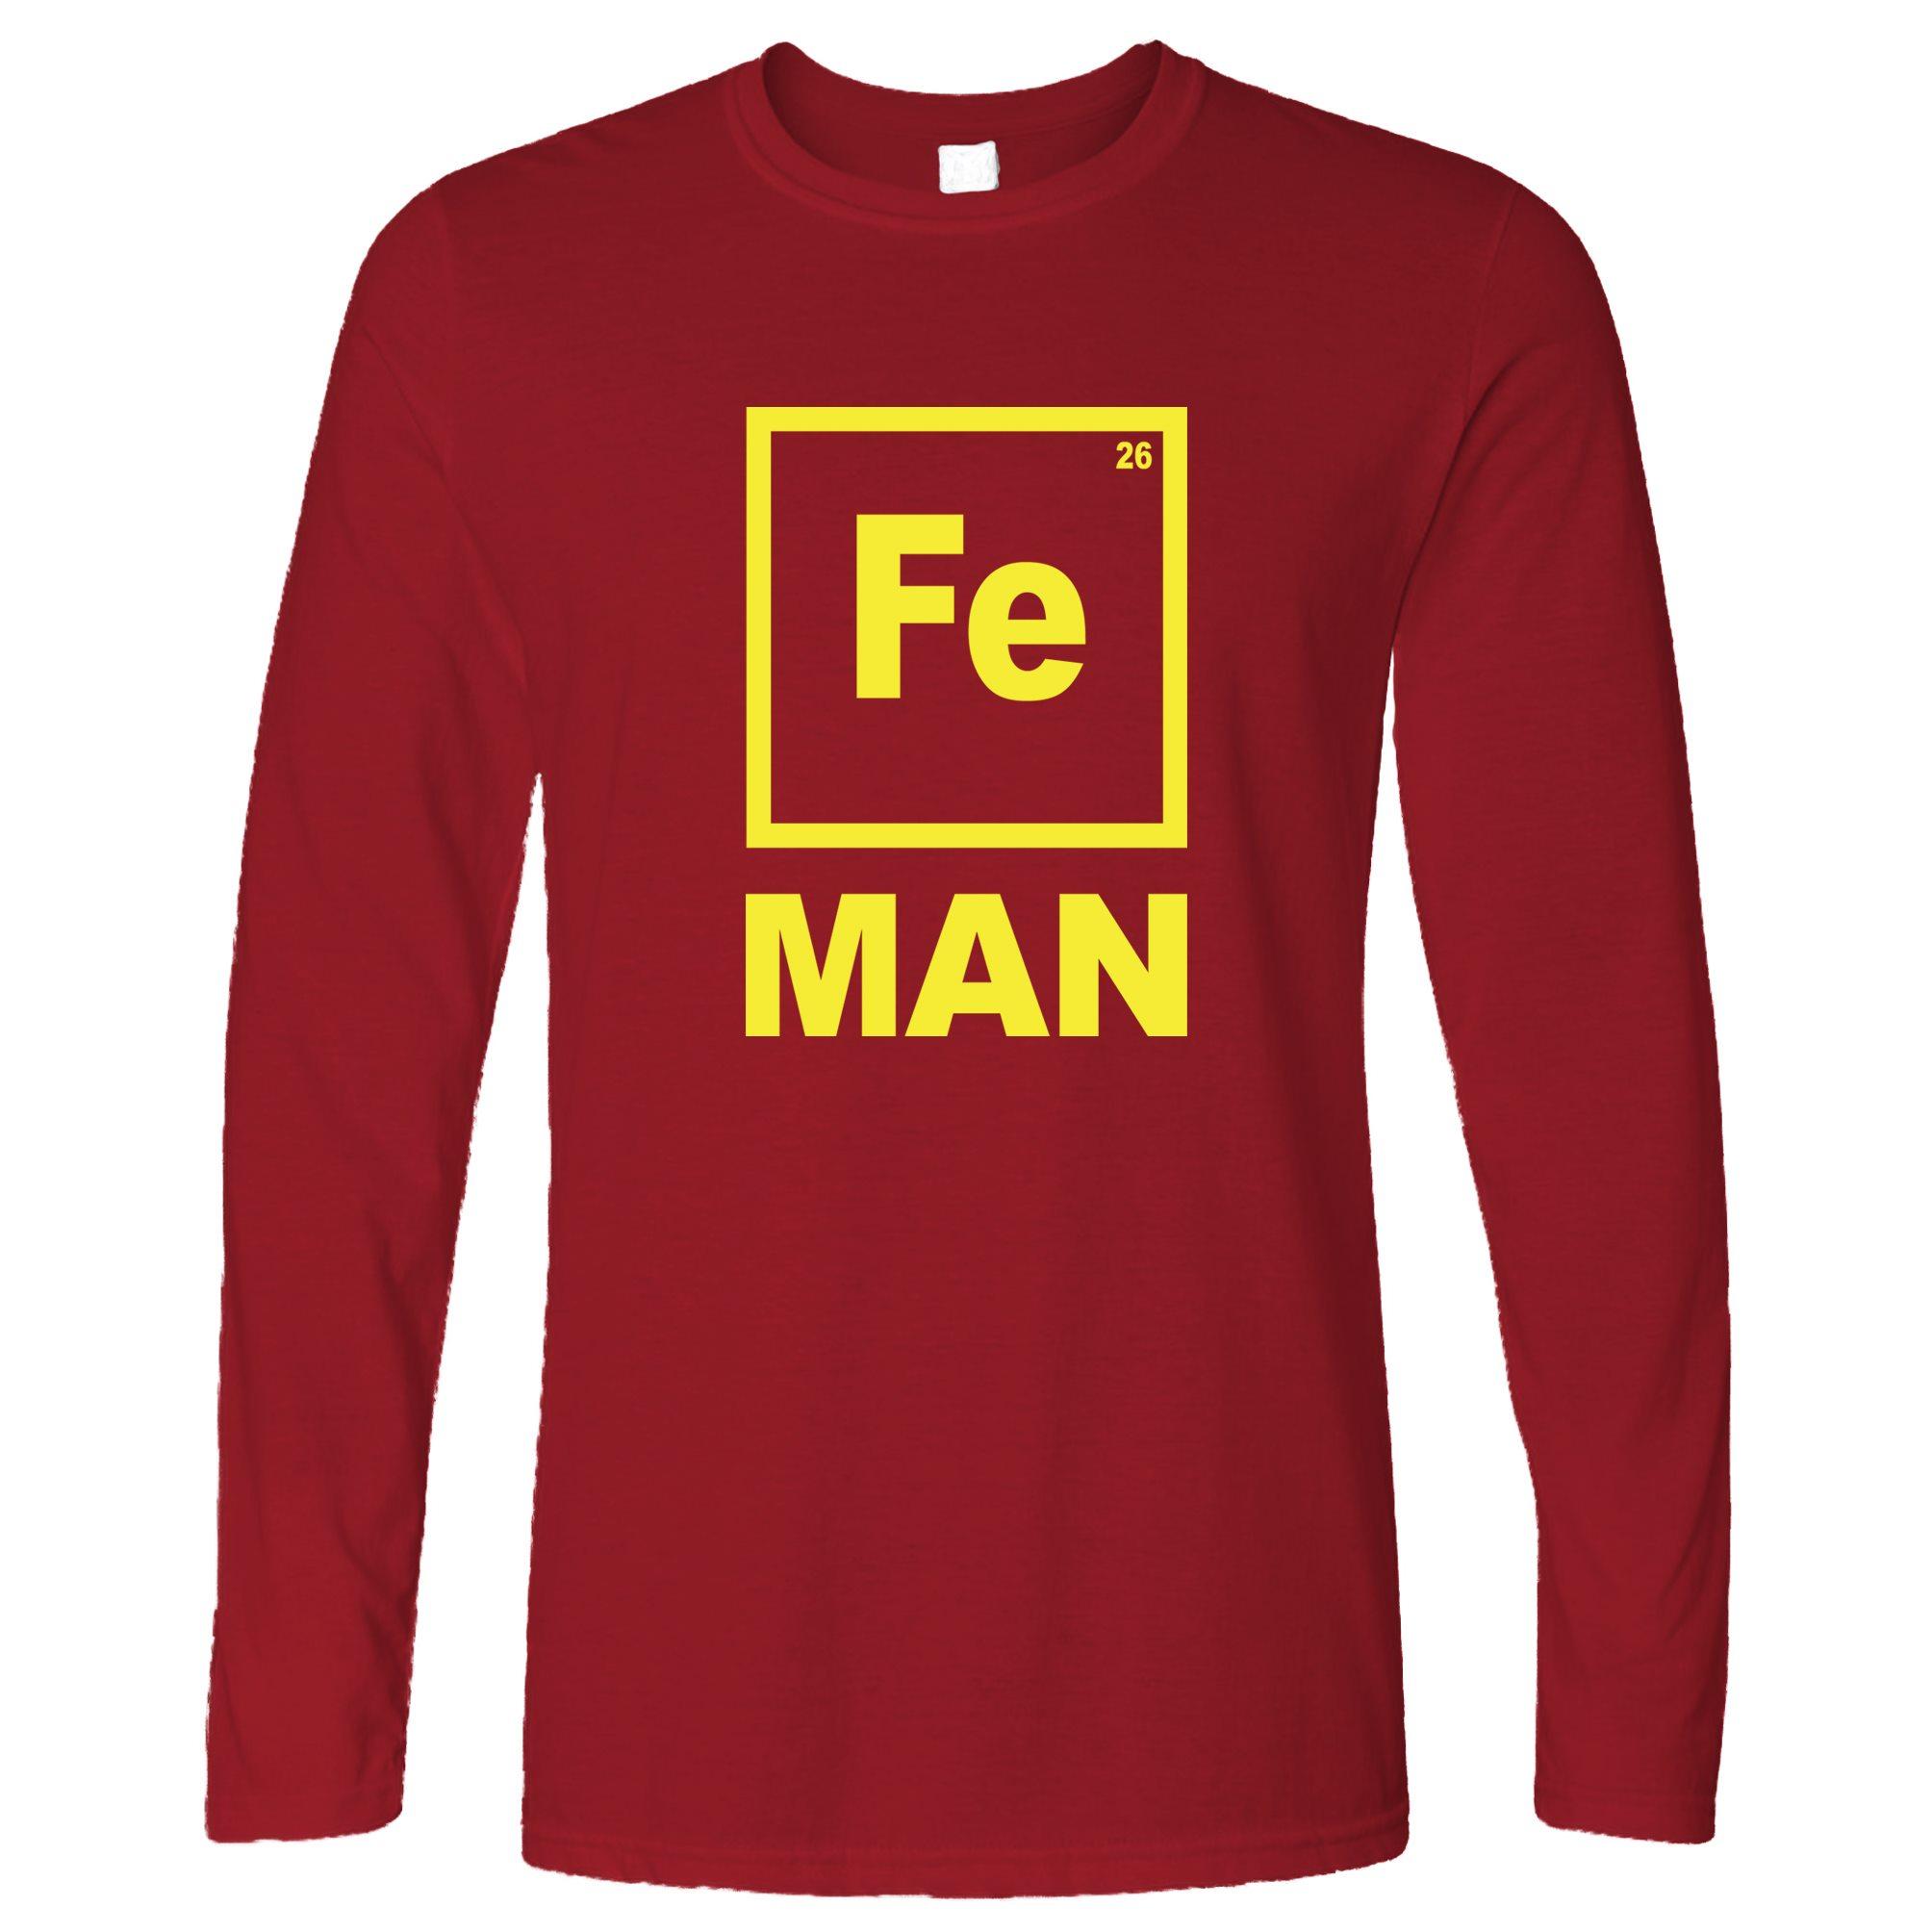 Fe Man Funny Chemistry Shirt Periodic Table Element Elemental Long